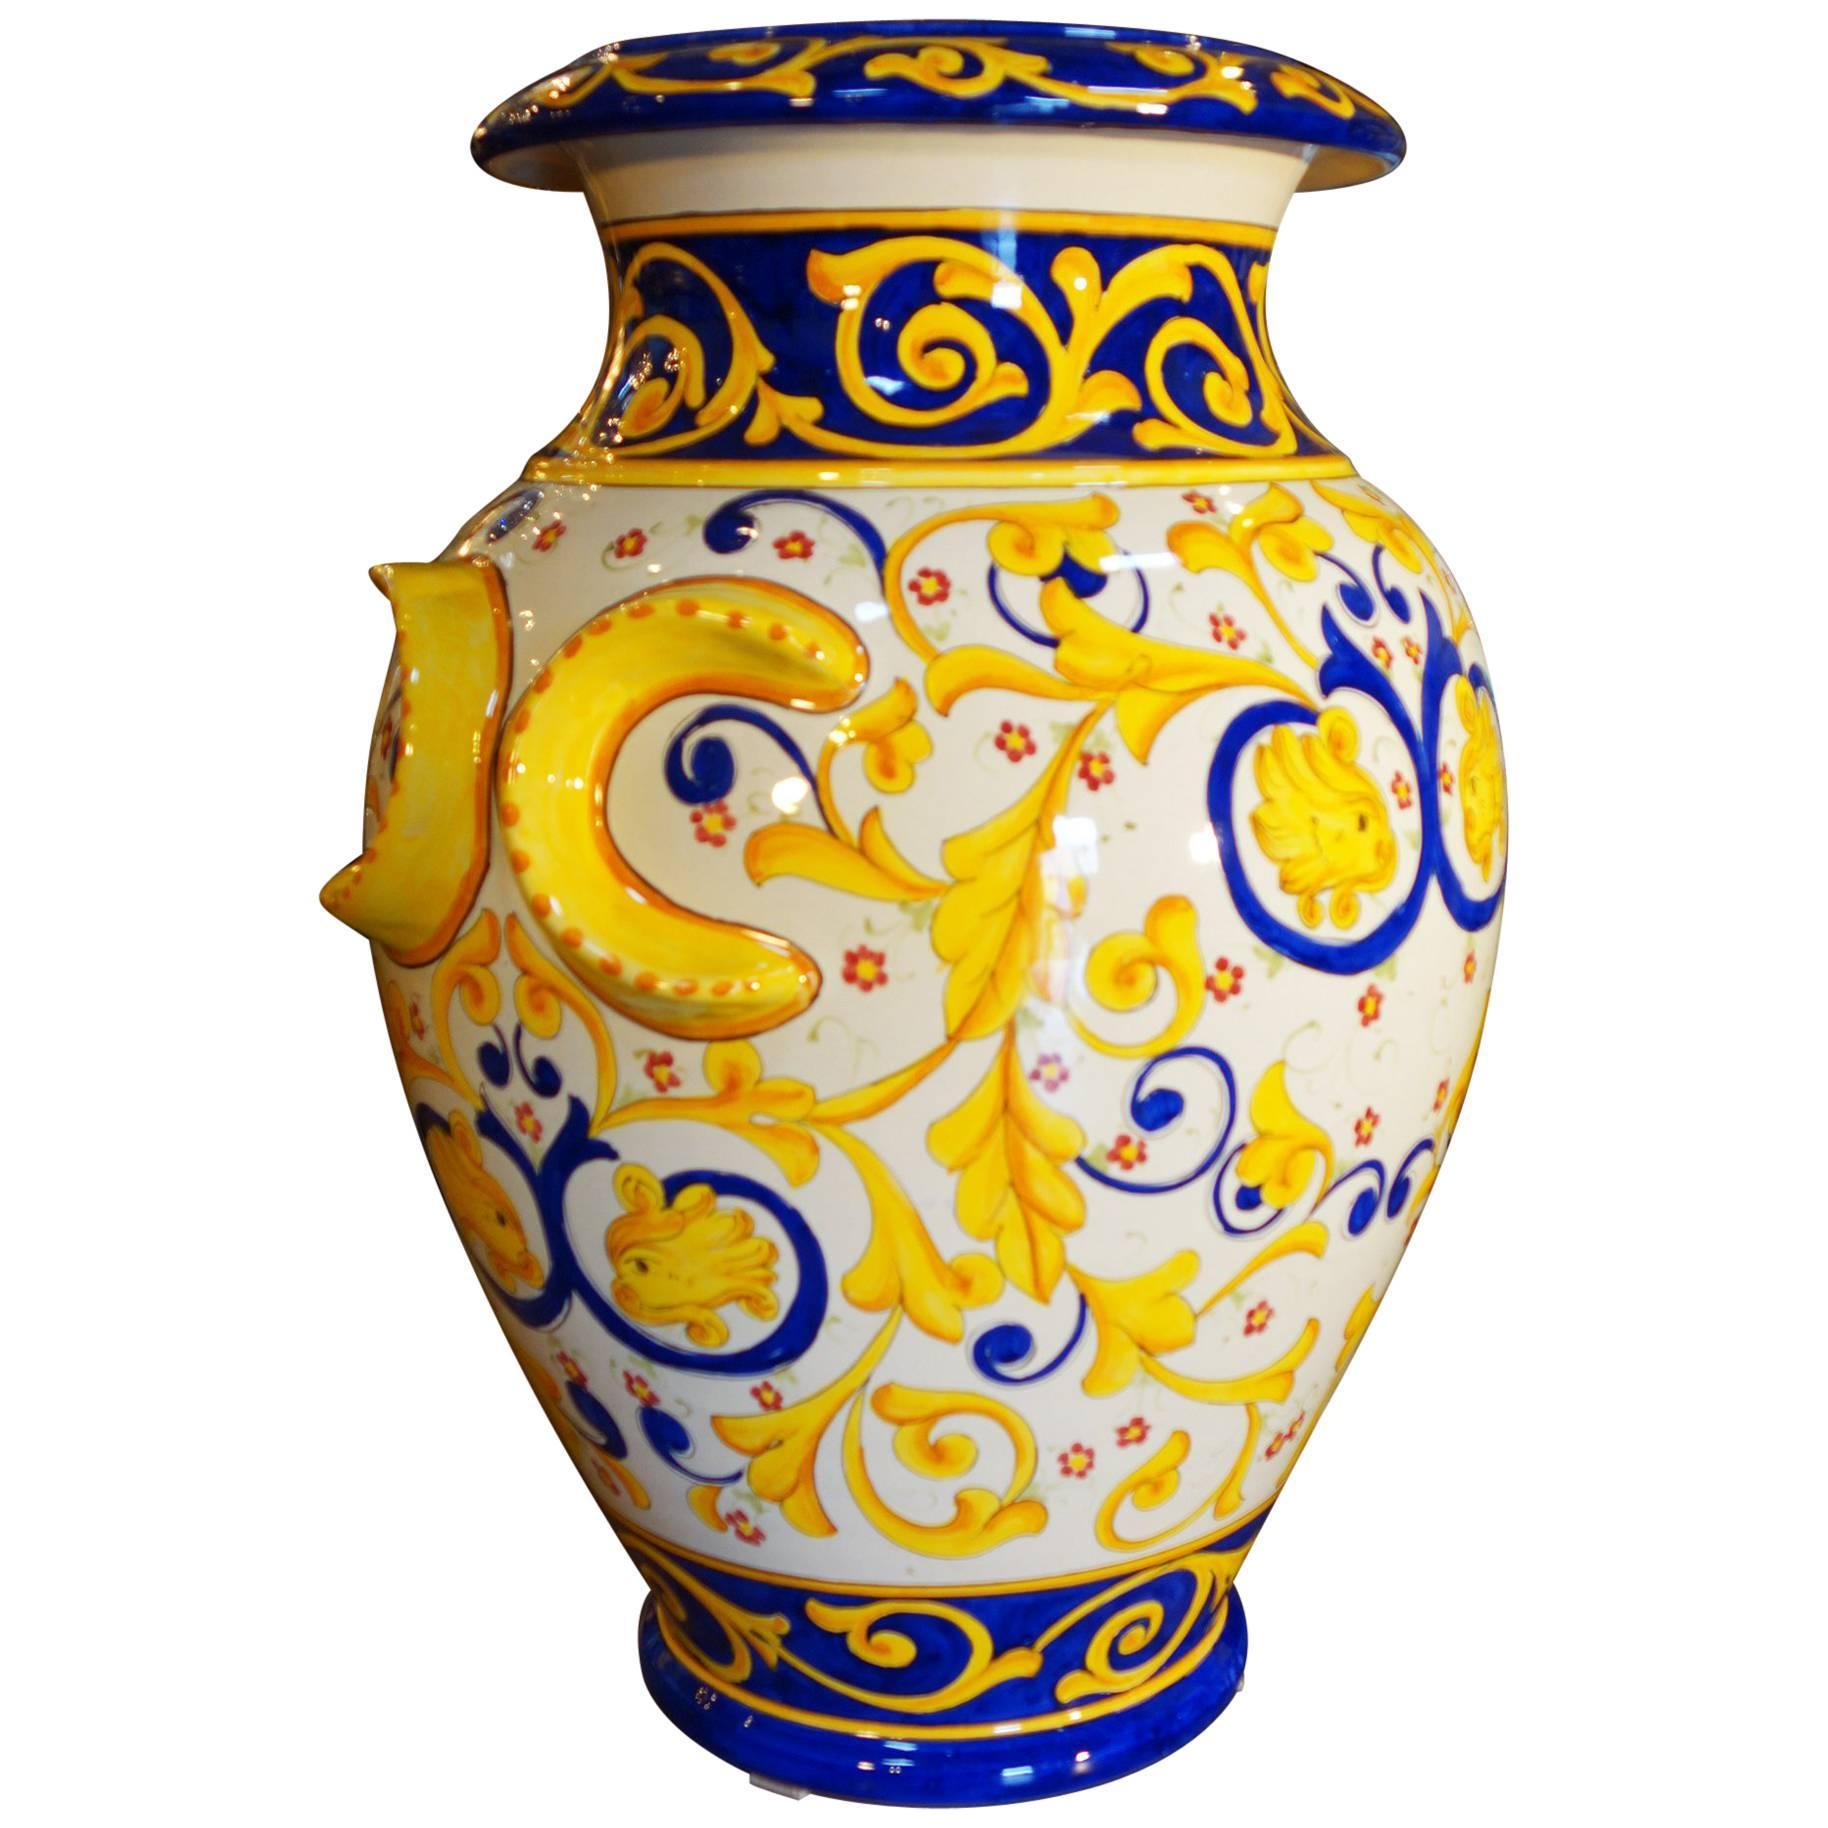 Antique Italian Reproduction Deruta Hand Painted Majolica Orci Vase